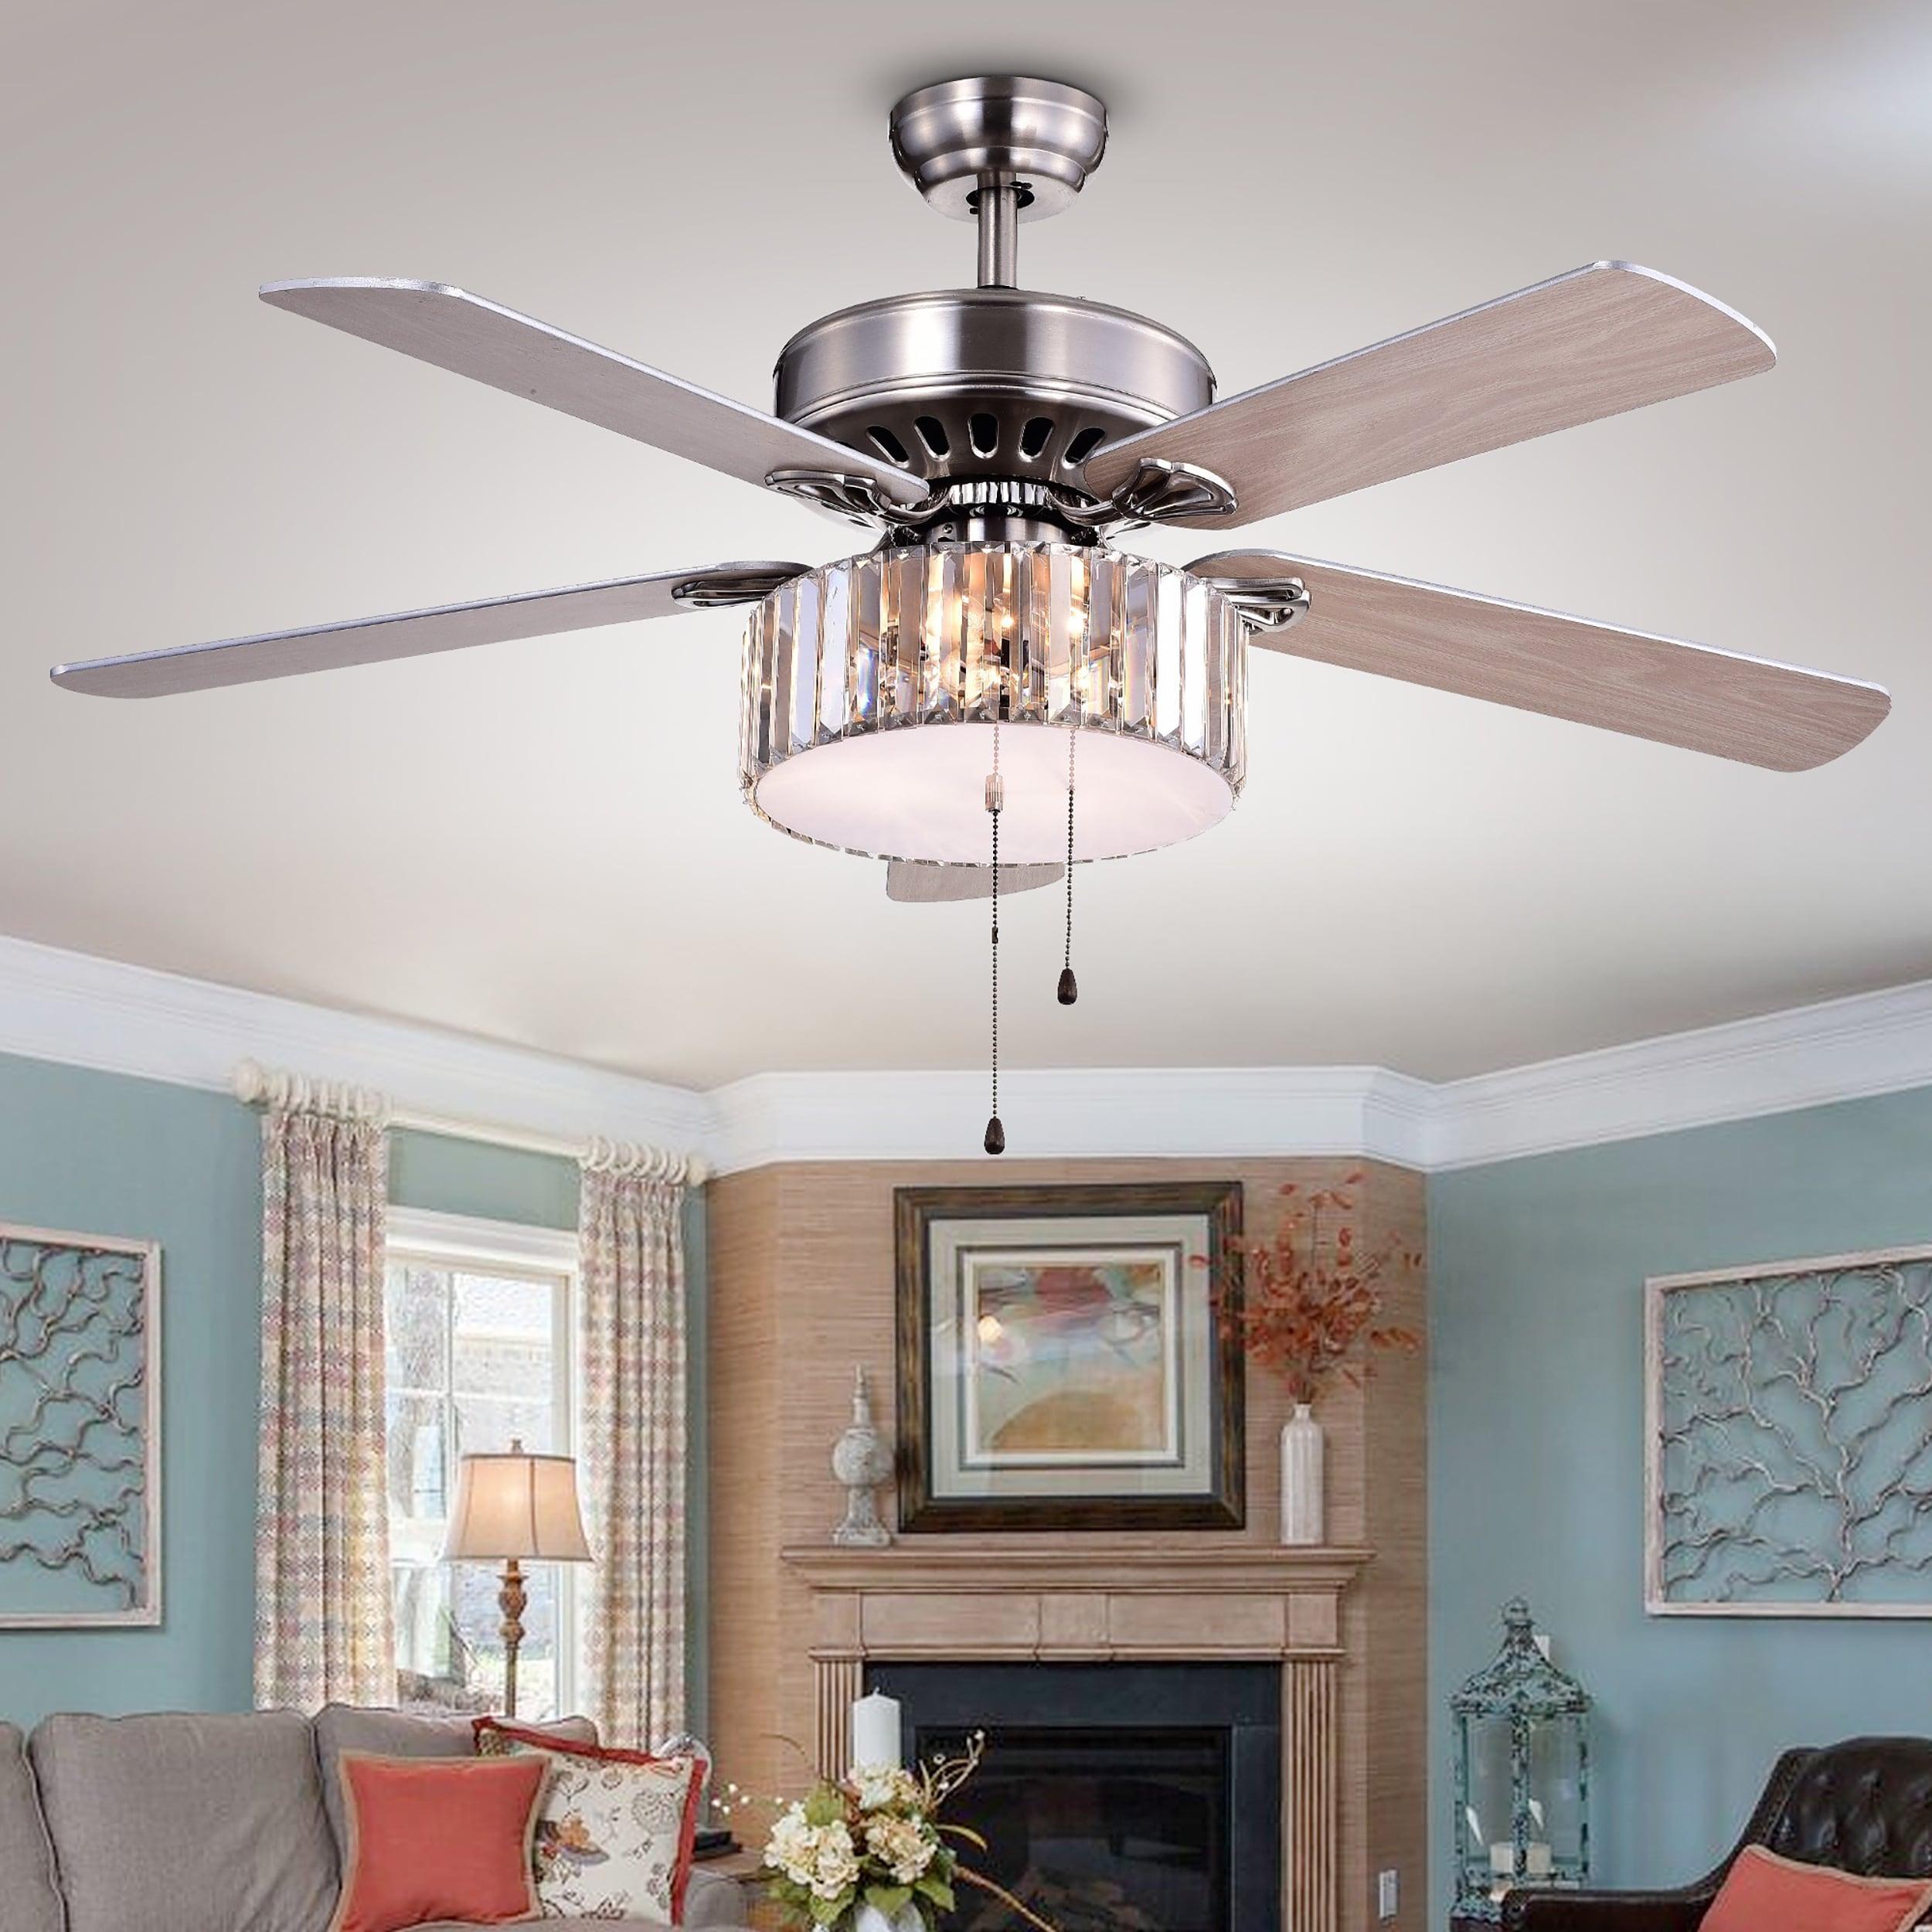 Shop kimalex 3 light 5 blade wood nickel crystal 52 inch ceiling fan kimalex 3 light 5 blade wood nickel crystal 52 inch ceiling fan mozeypictures Image collections